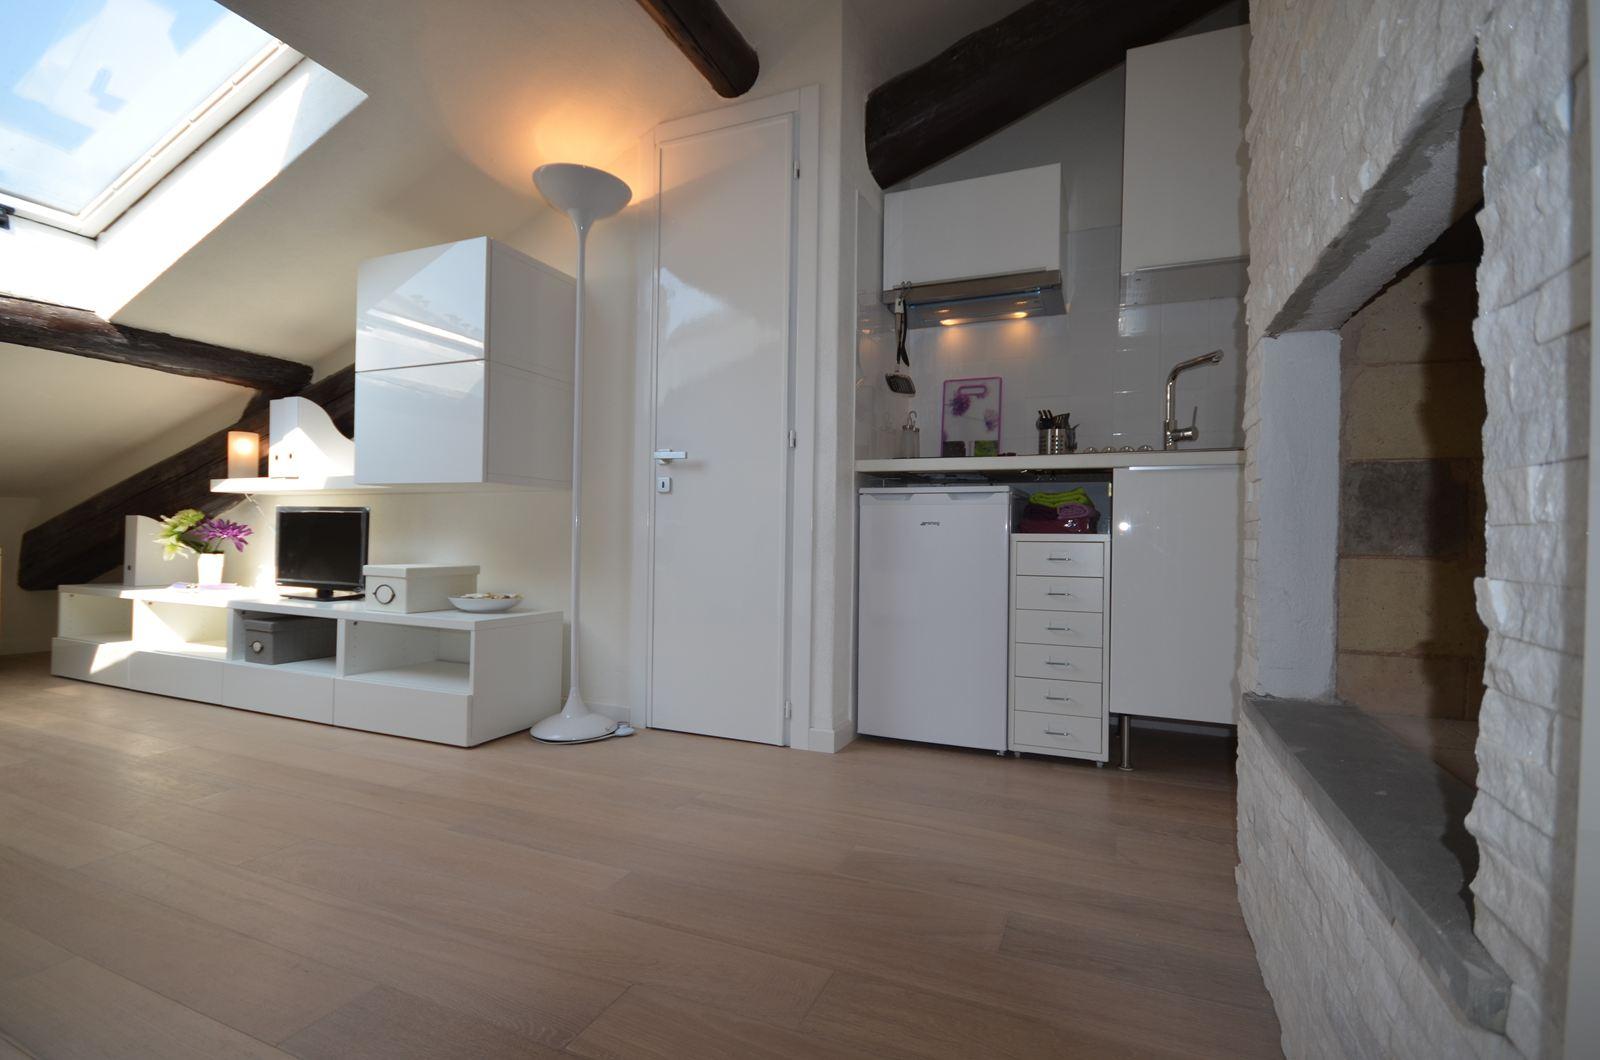 Cucine per mansarde basse cucine con penisola arredamenti per mansarde sedie poltrone offerte - Cucine per mansarda ...